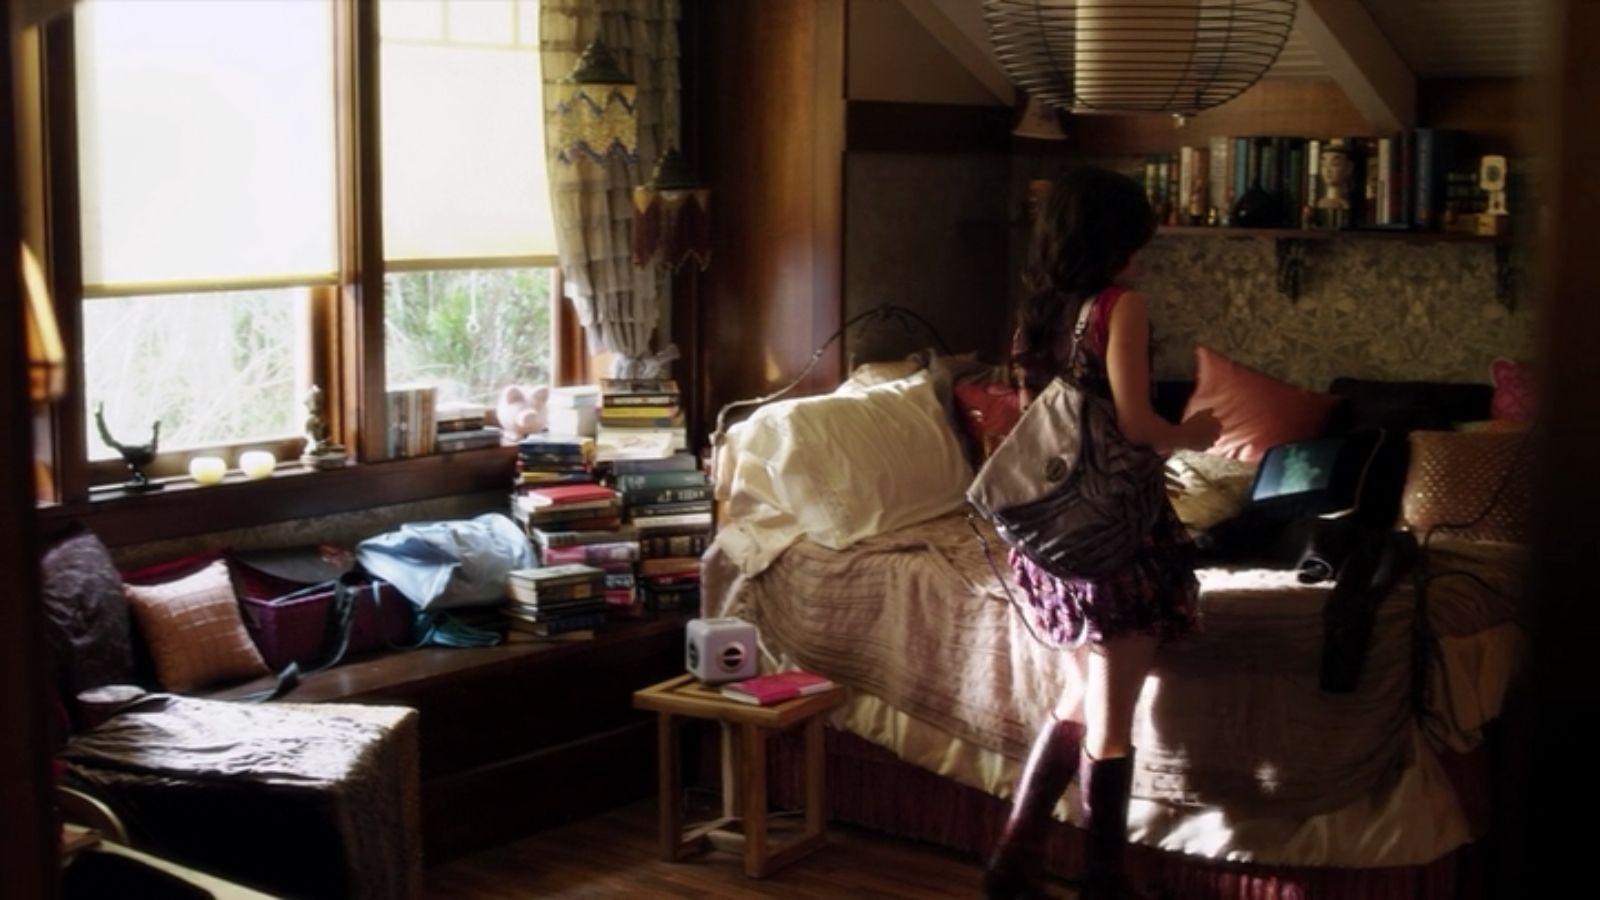 Aria S Bedroom Pretty Little Liars Pretty Little Liars Bedroom Renovation Girl S Room